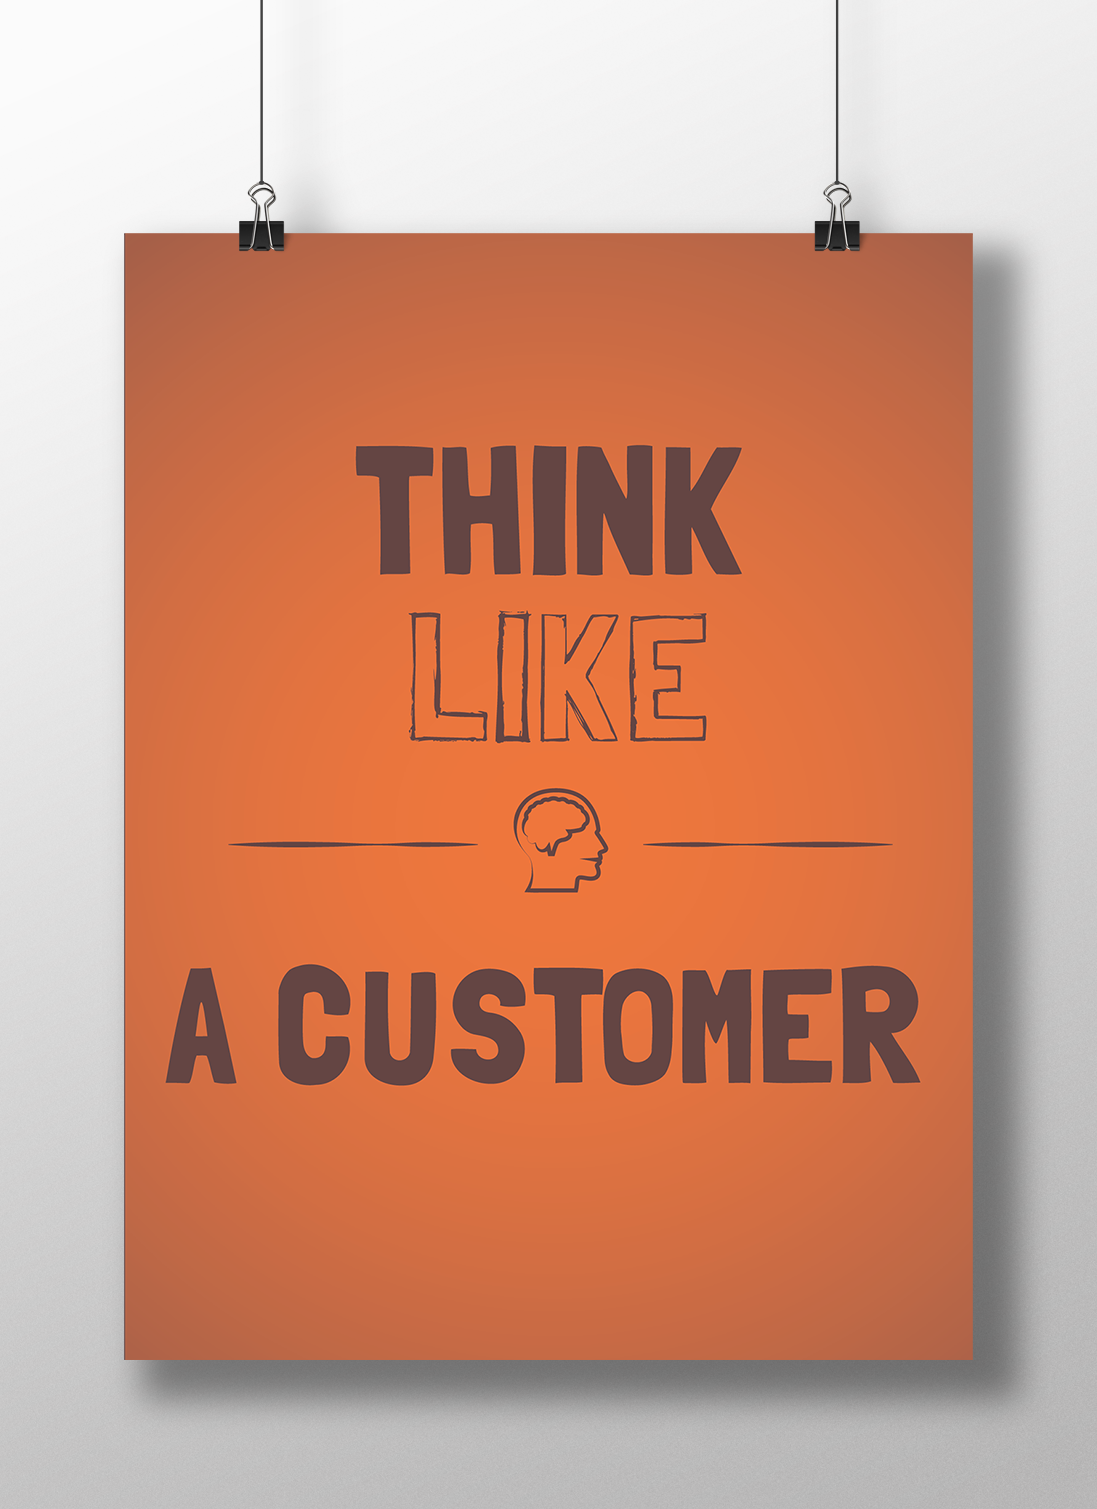 think-like-a-customer-affiche